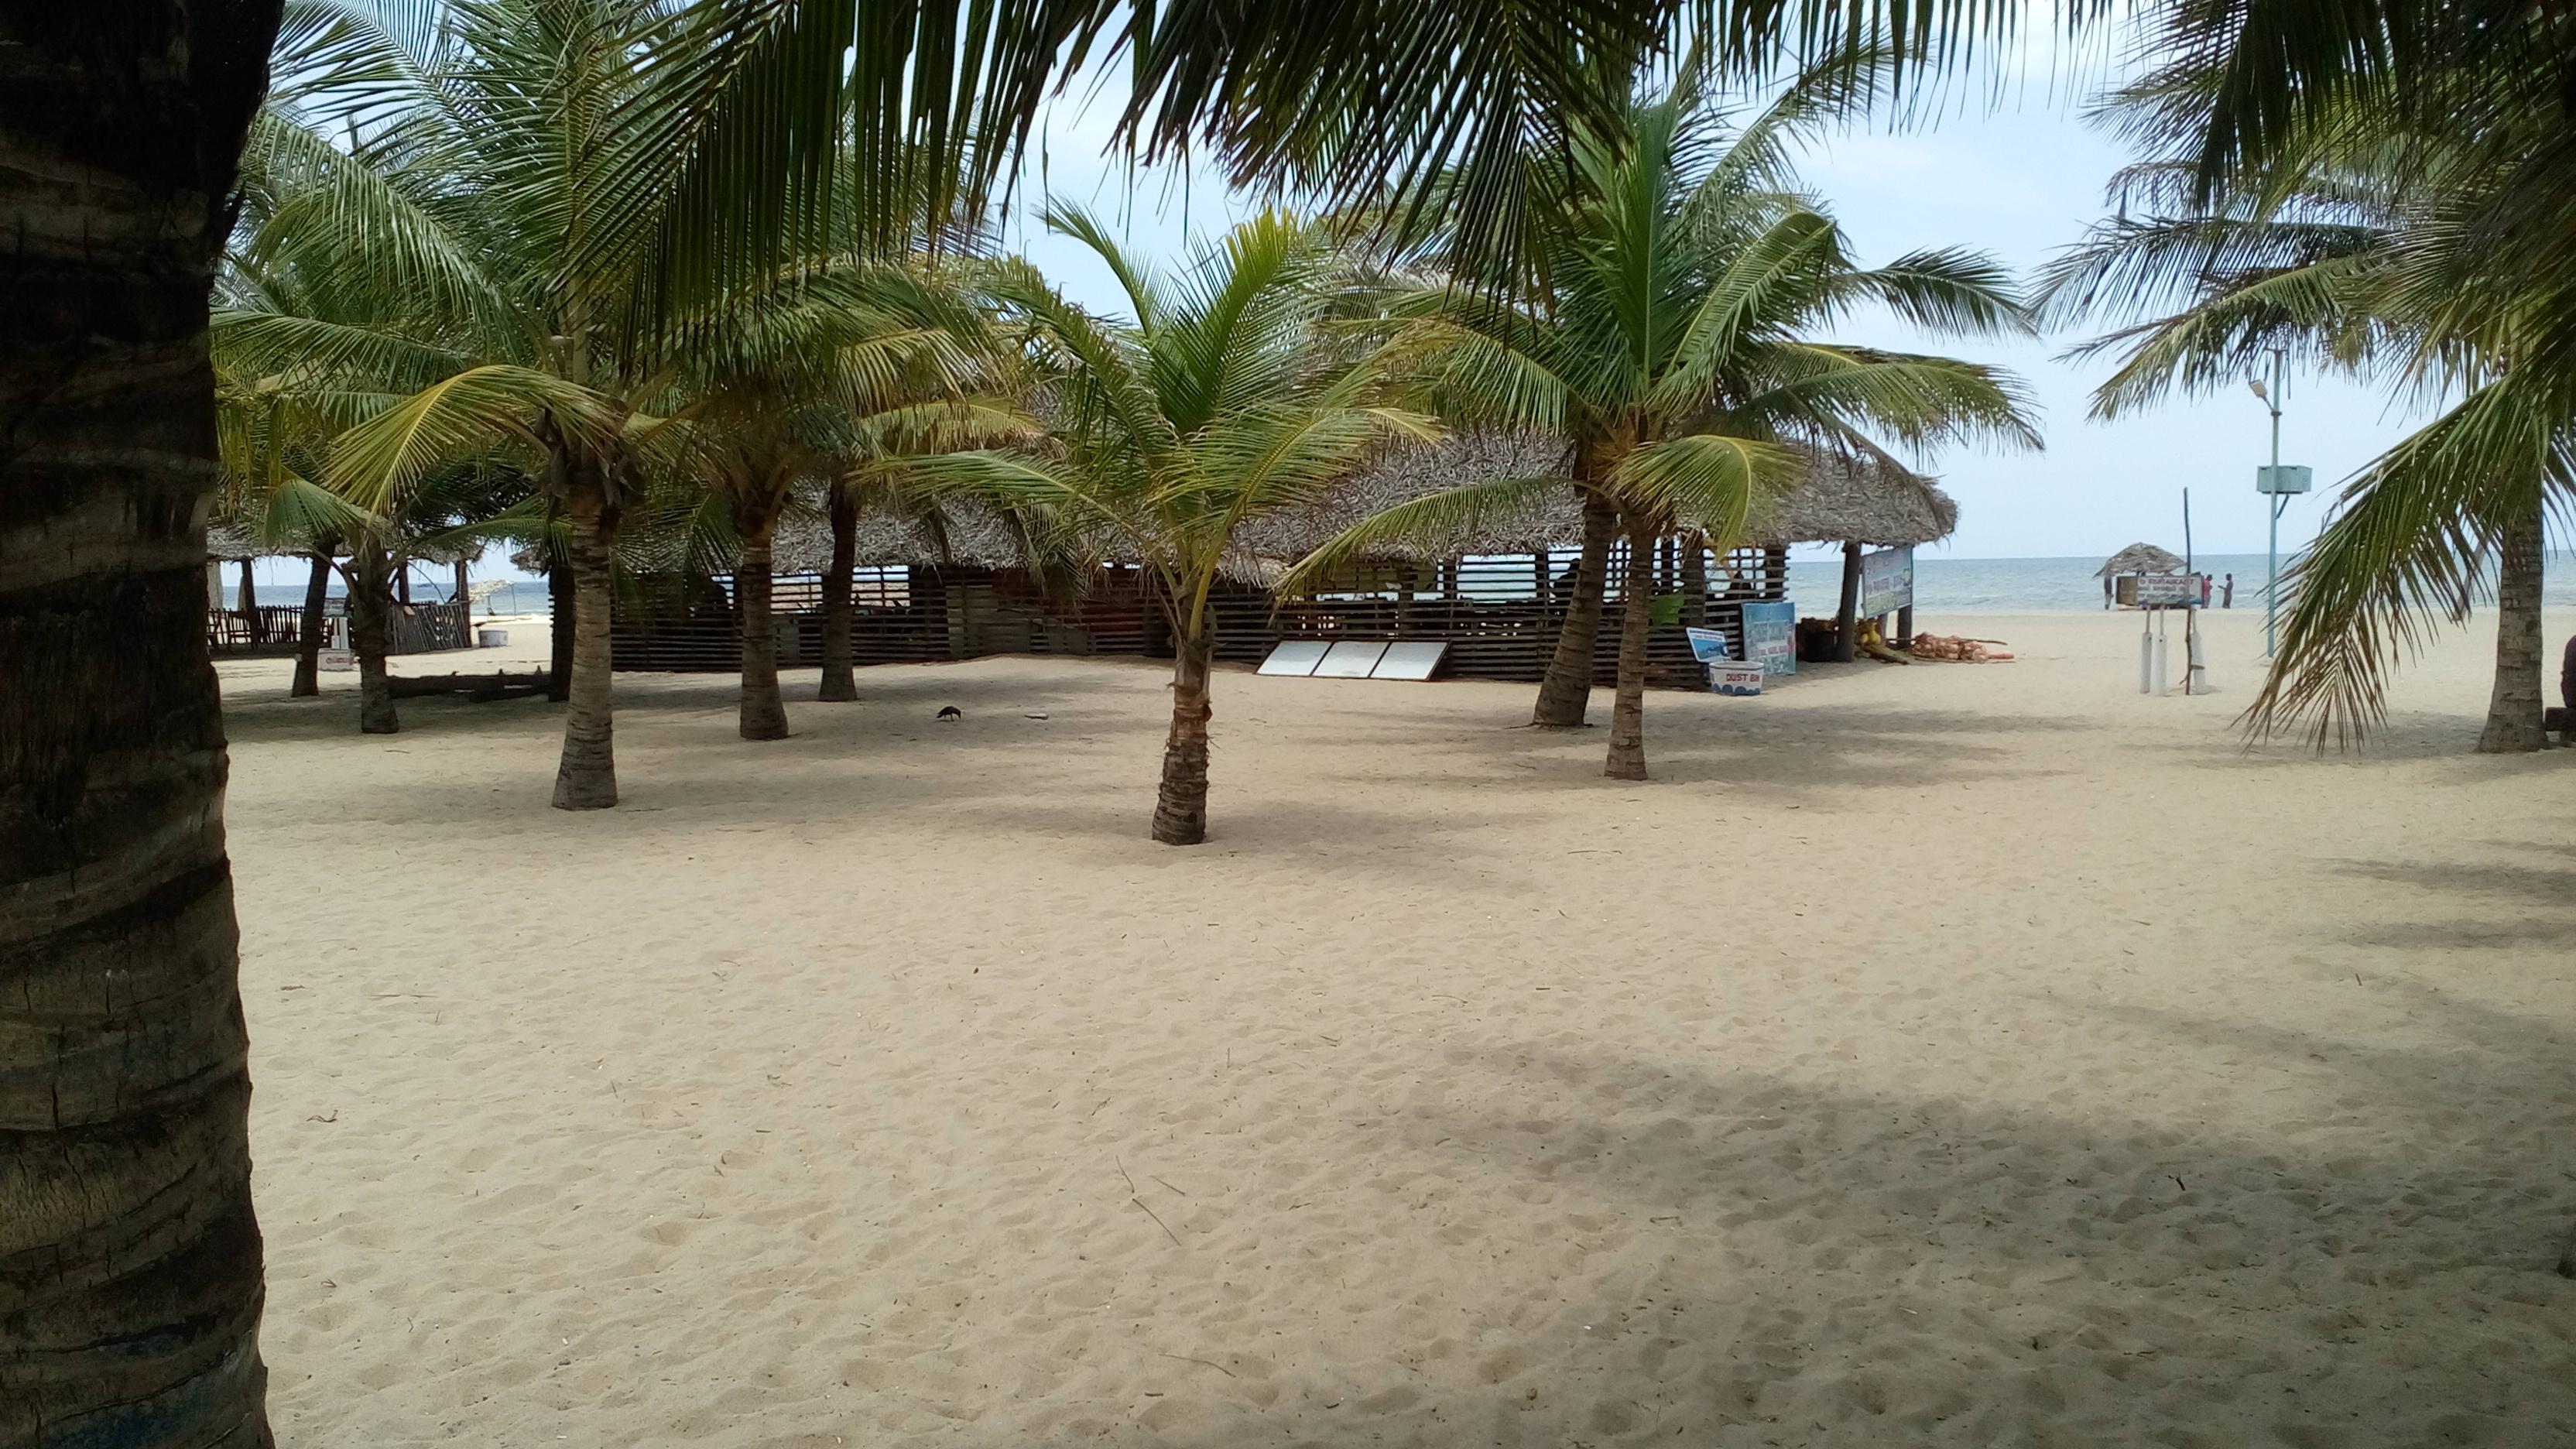 Plage Paradiso (Paradise Beach)